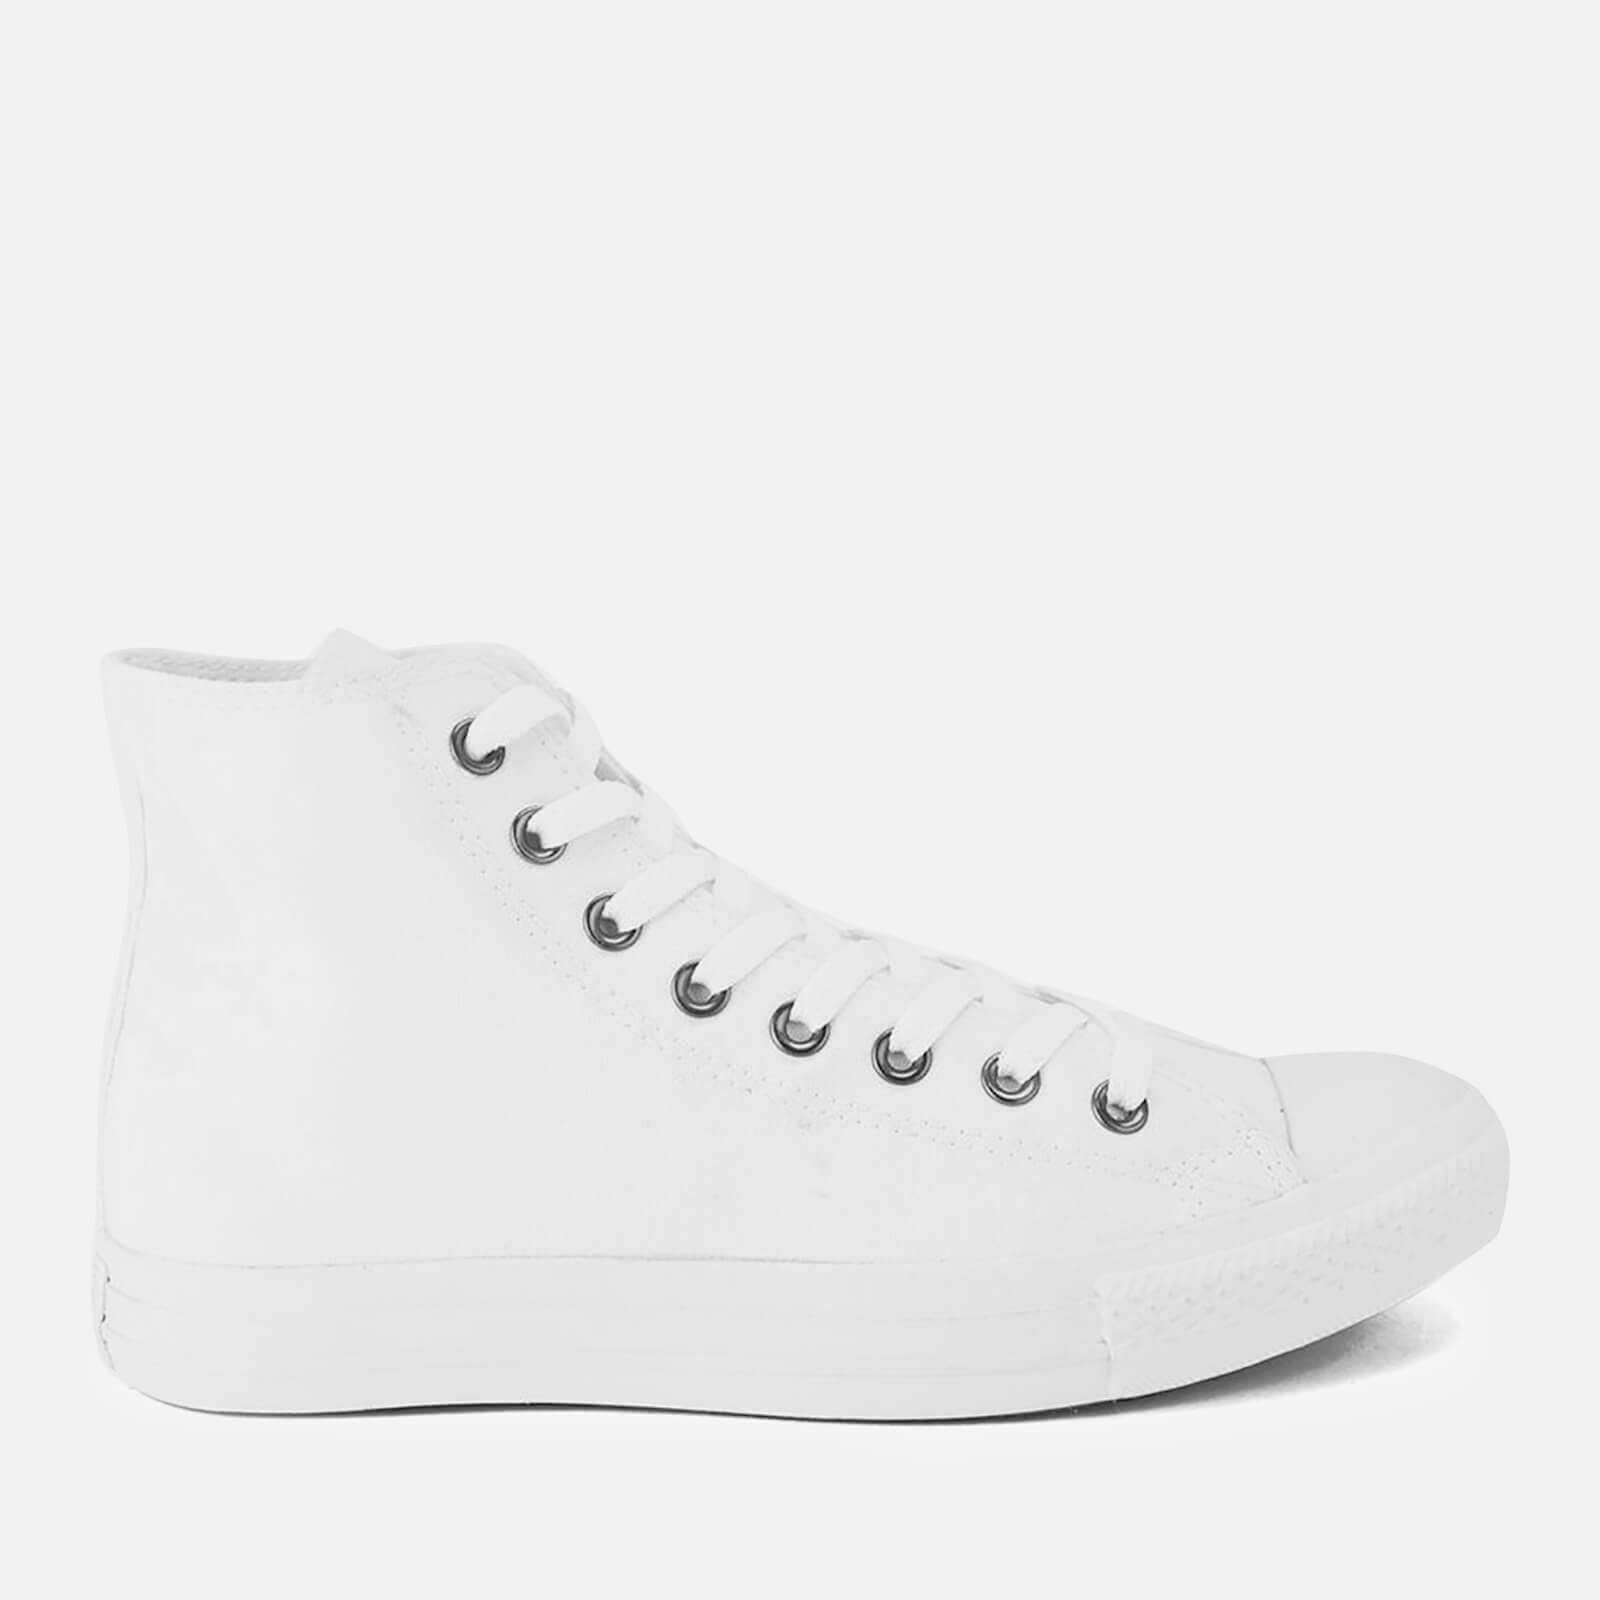 kastanjebruin Taylor Converse Seasonal sneaker 2018 top Chuck All wit high Star FcKTl1J